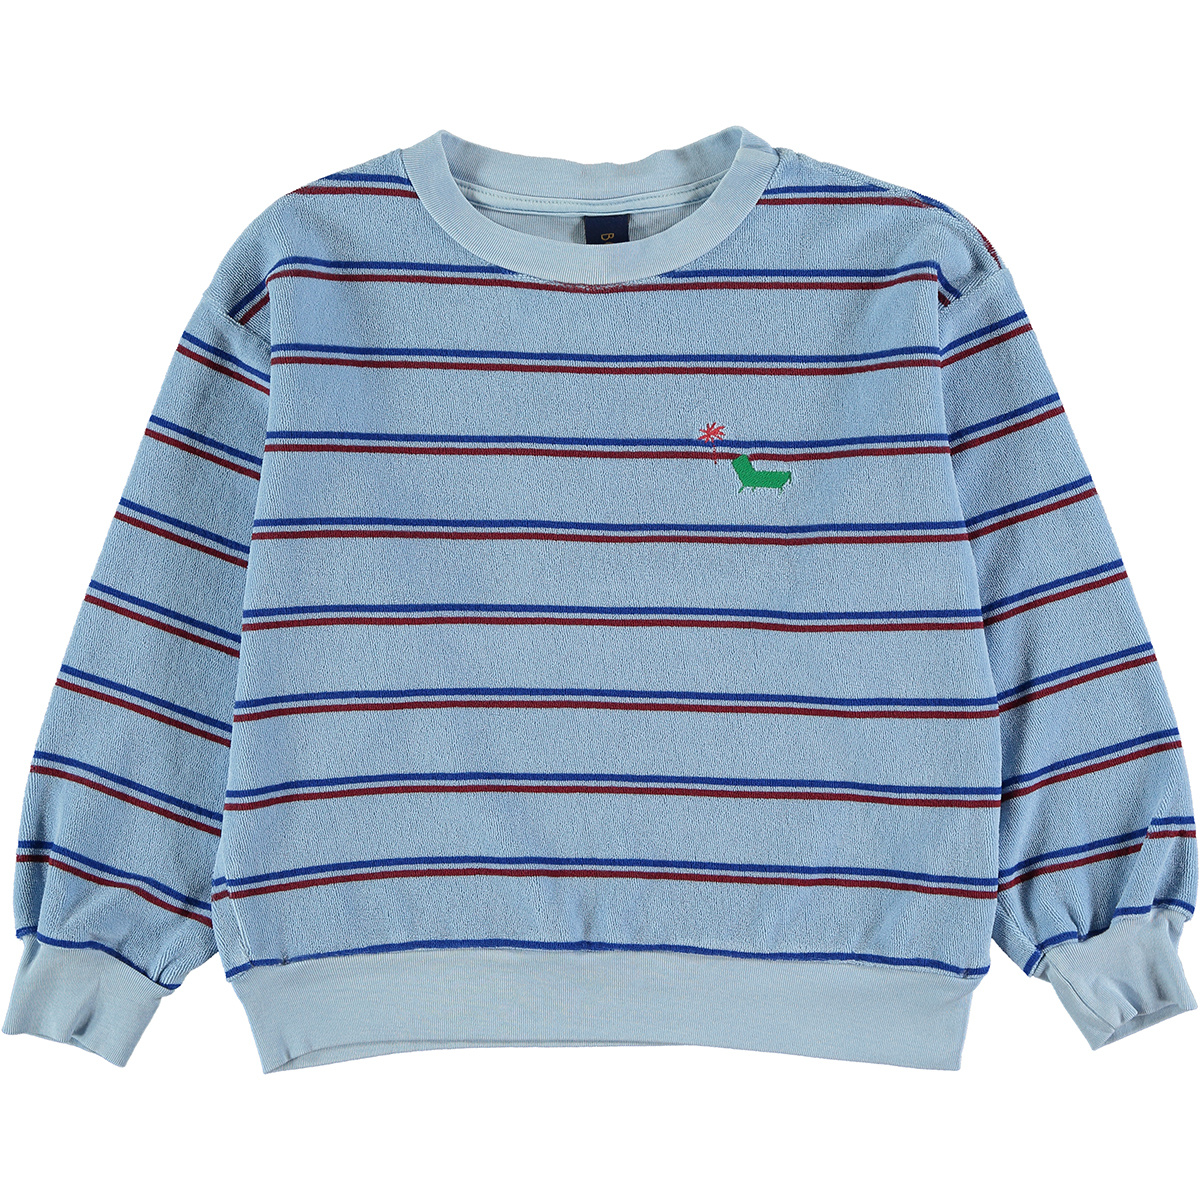 Sweatshirt baby Stripe - Light Blue-1